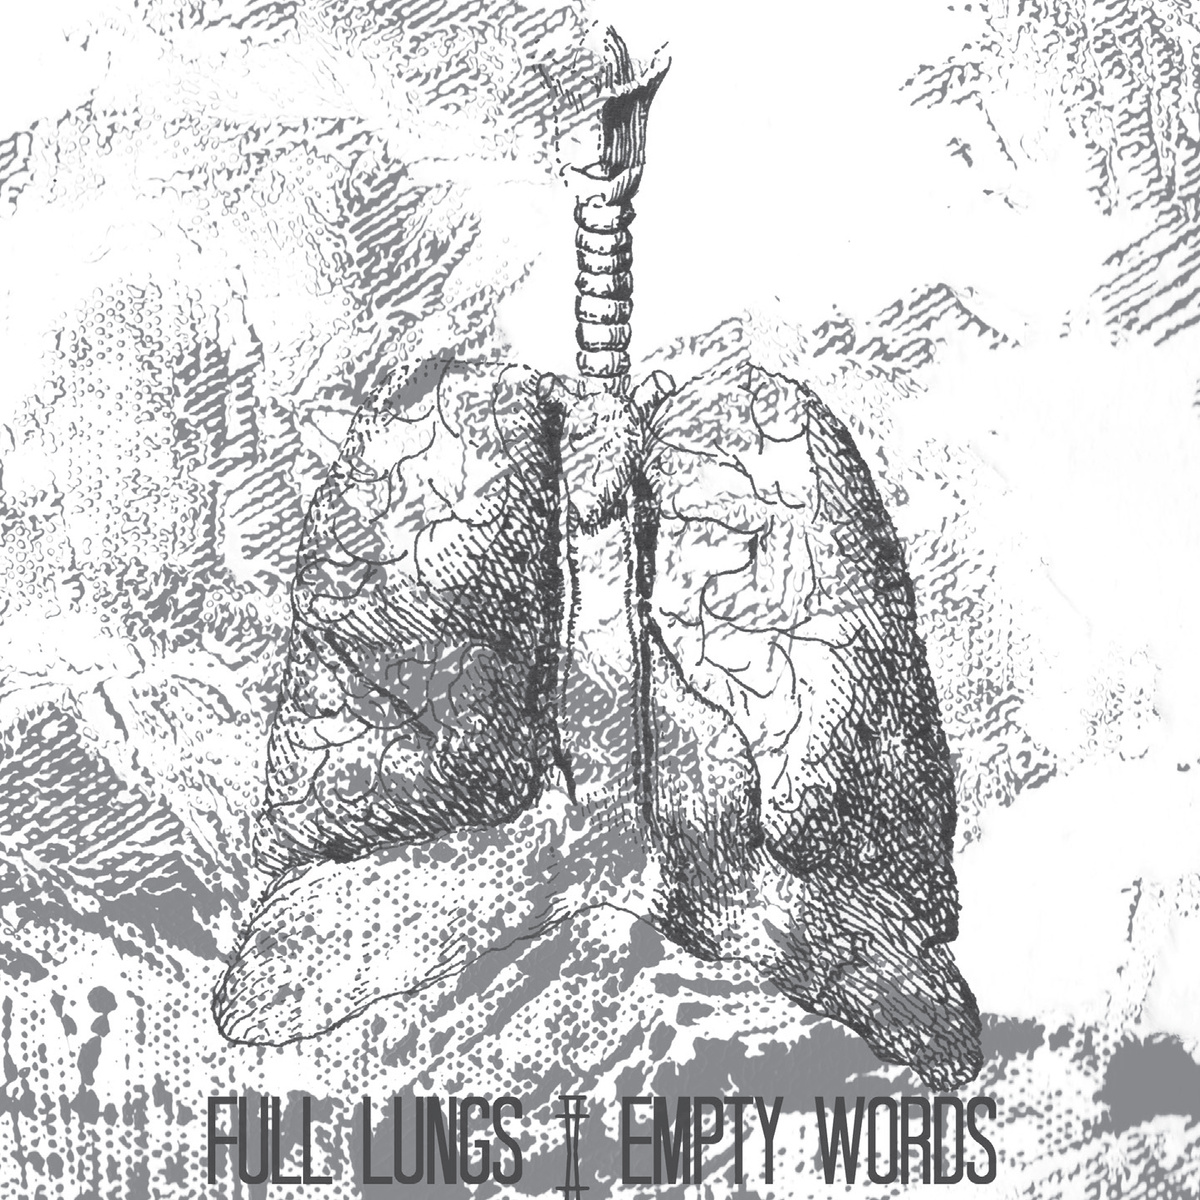 Black Art – Full Lungs | Empty Words